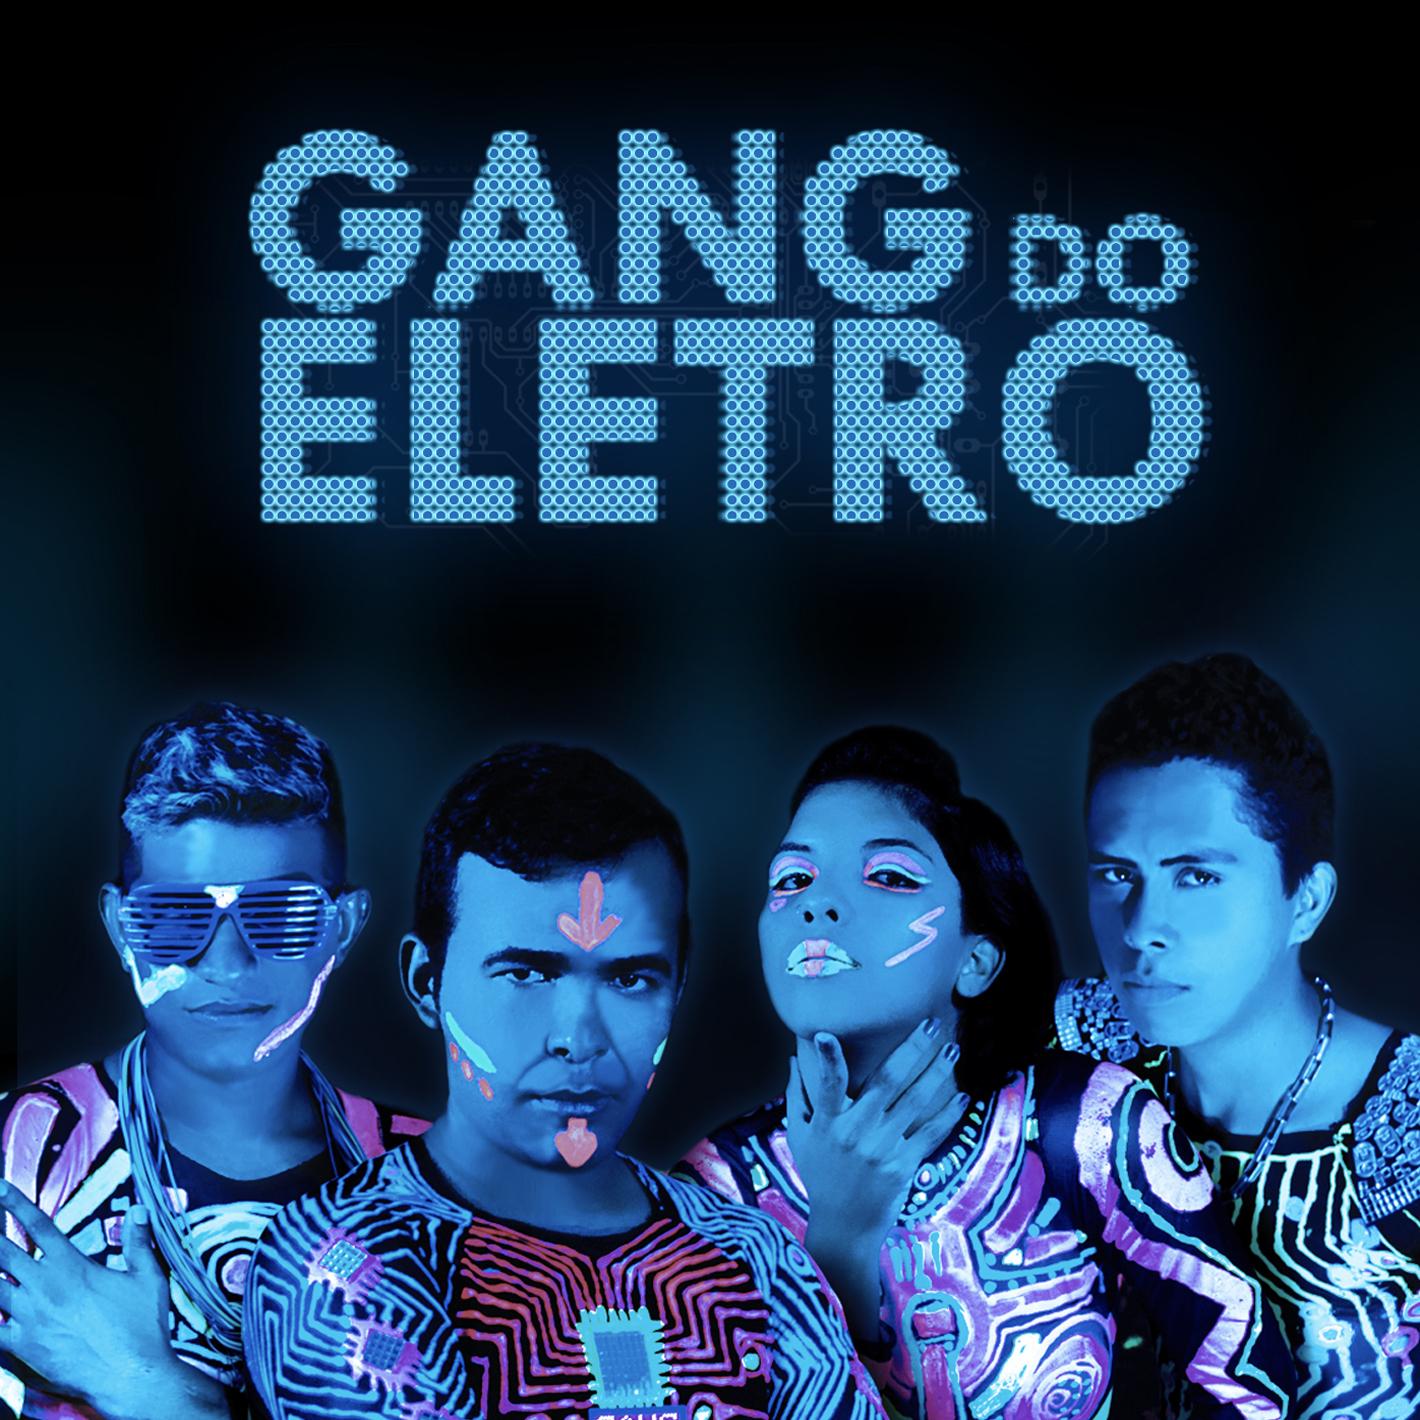 Gang do Eletro